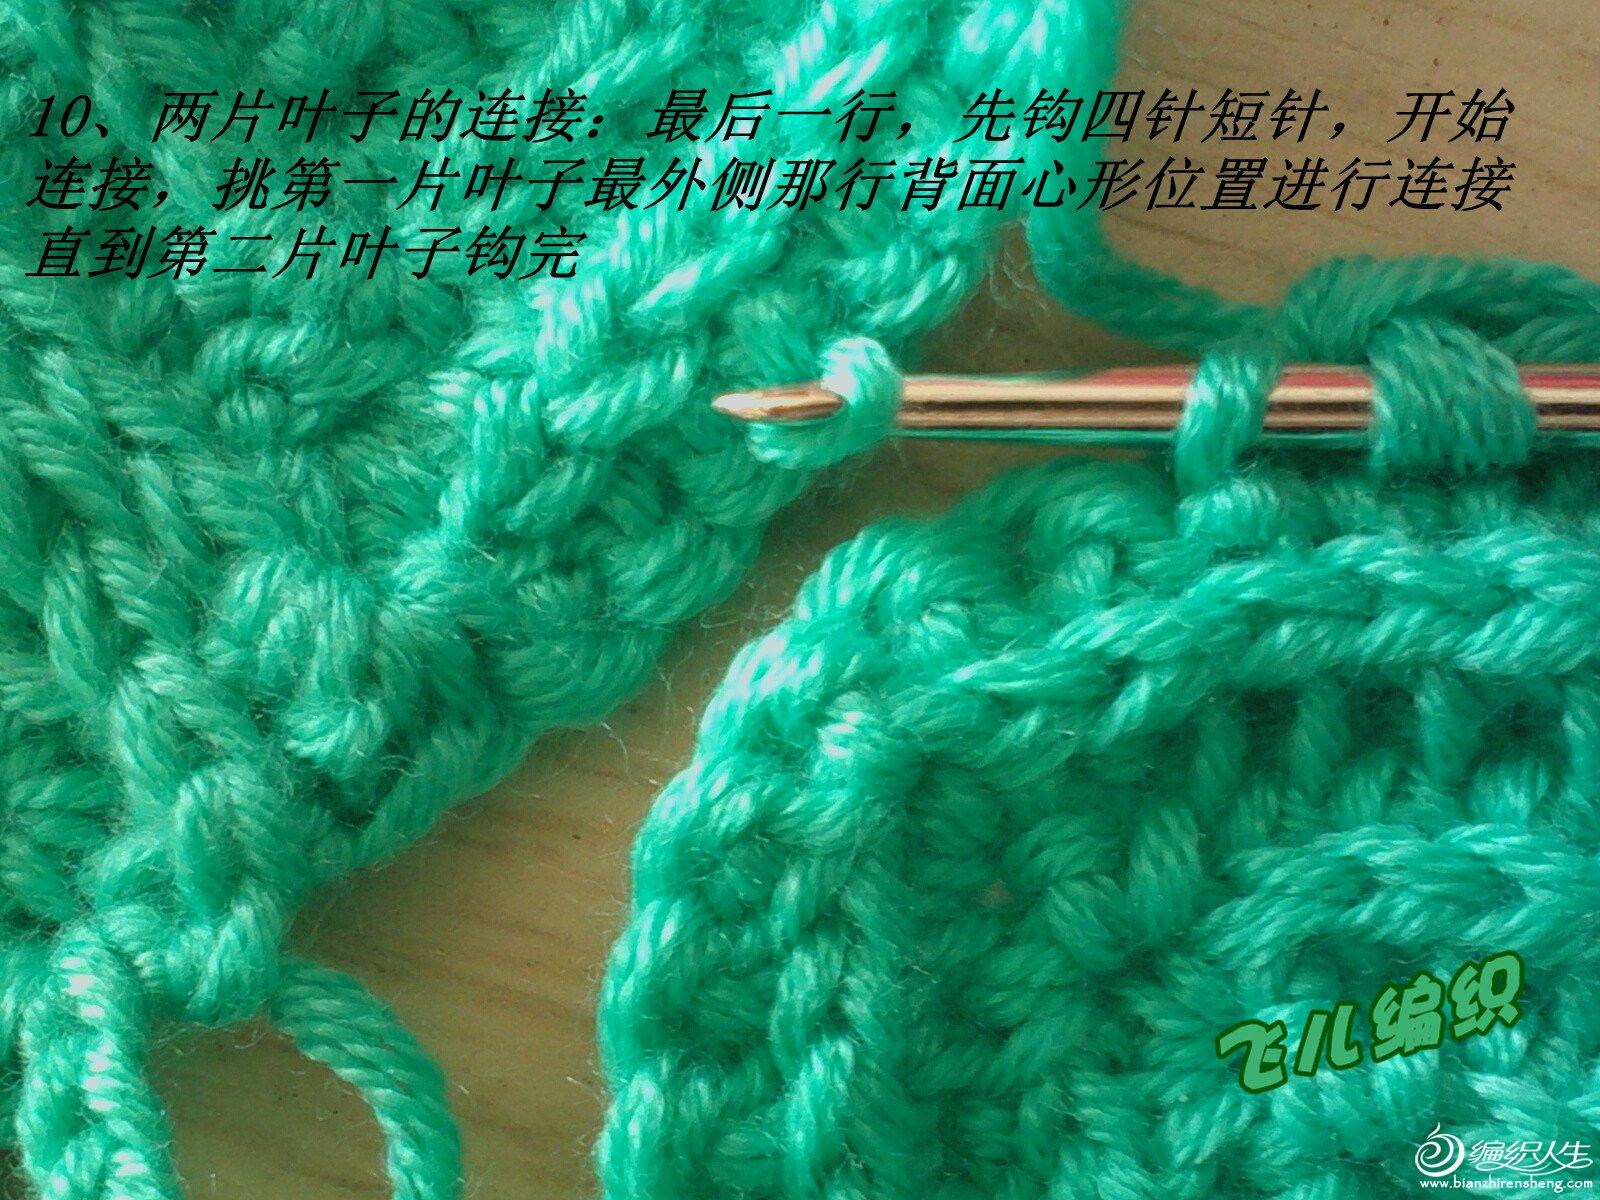 IMG1519_副本.jpg